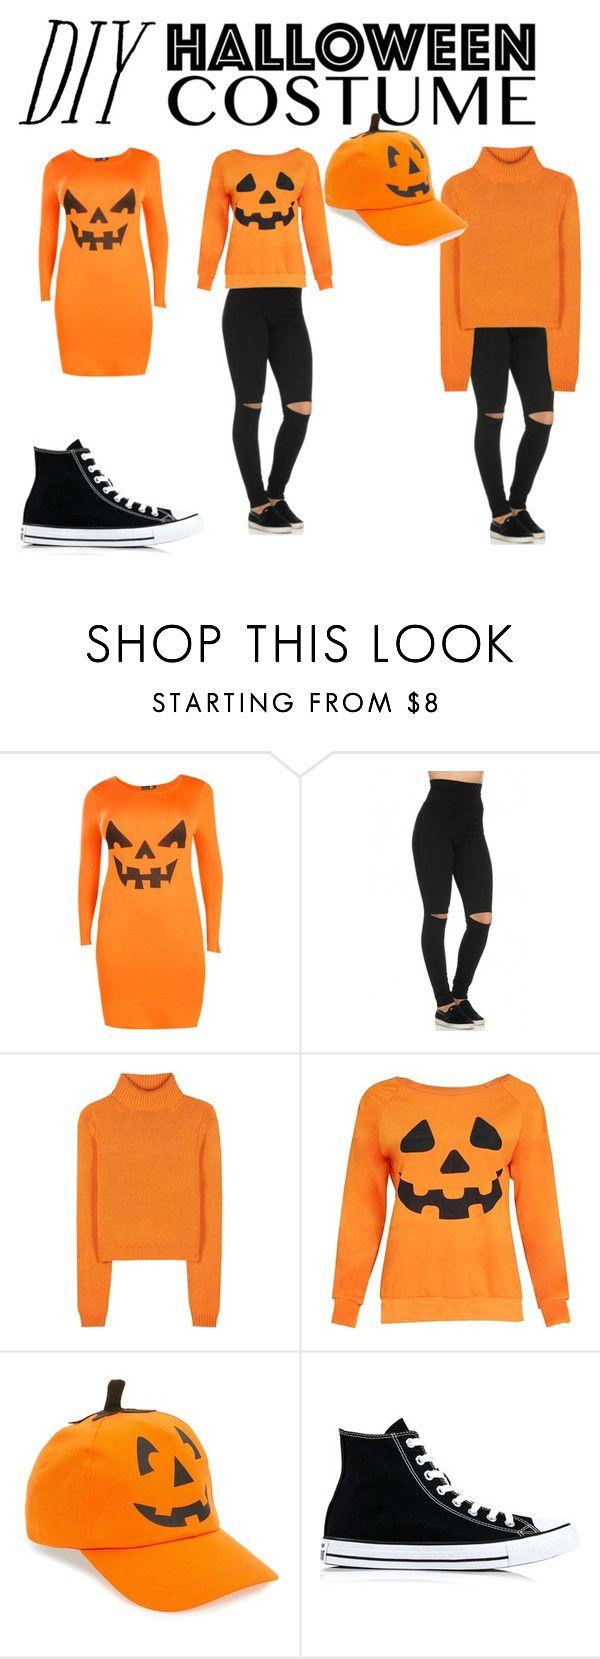 """DIY Pumpkin costume"" by heyoitsadriene ❤ liked on Polyvore featuring Boohoo, Acne Studios, David & Young, Converse, halloweencostume and DIYHalloween"